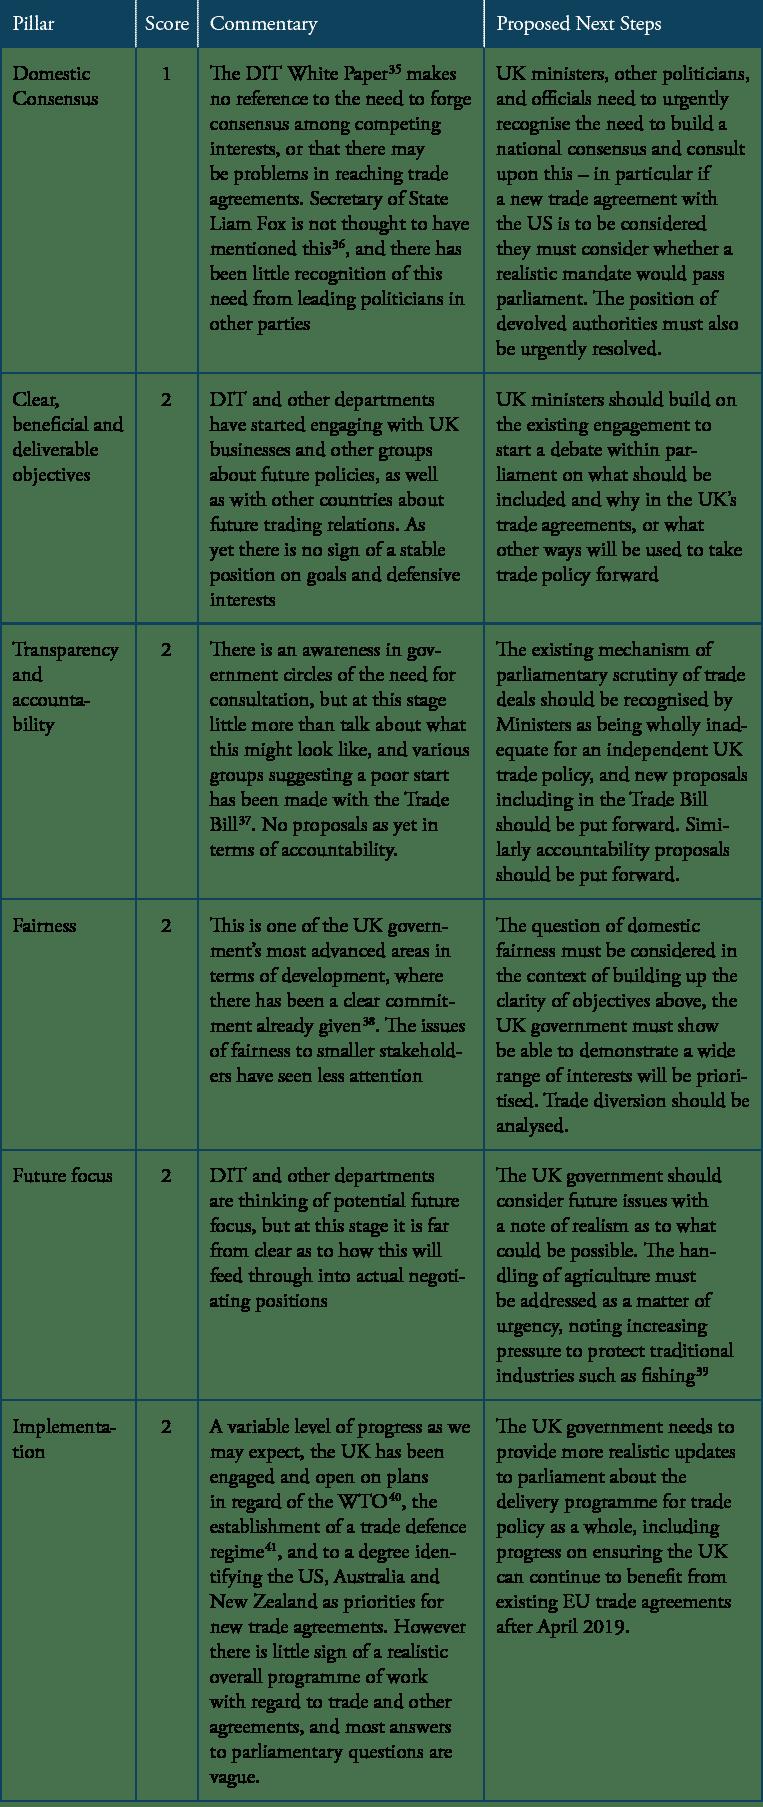 ECI_18_UKTradePolicy_TABLE2_4_2018_LY01